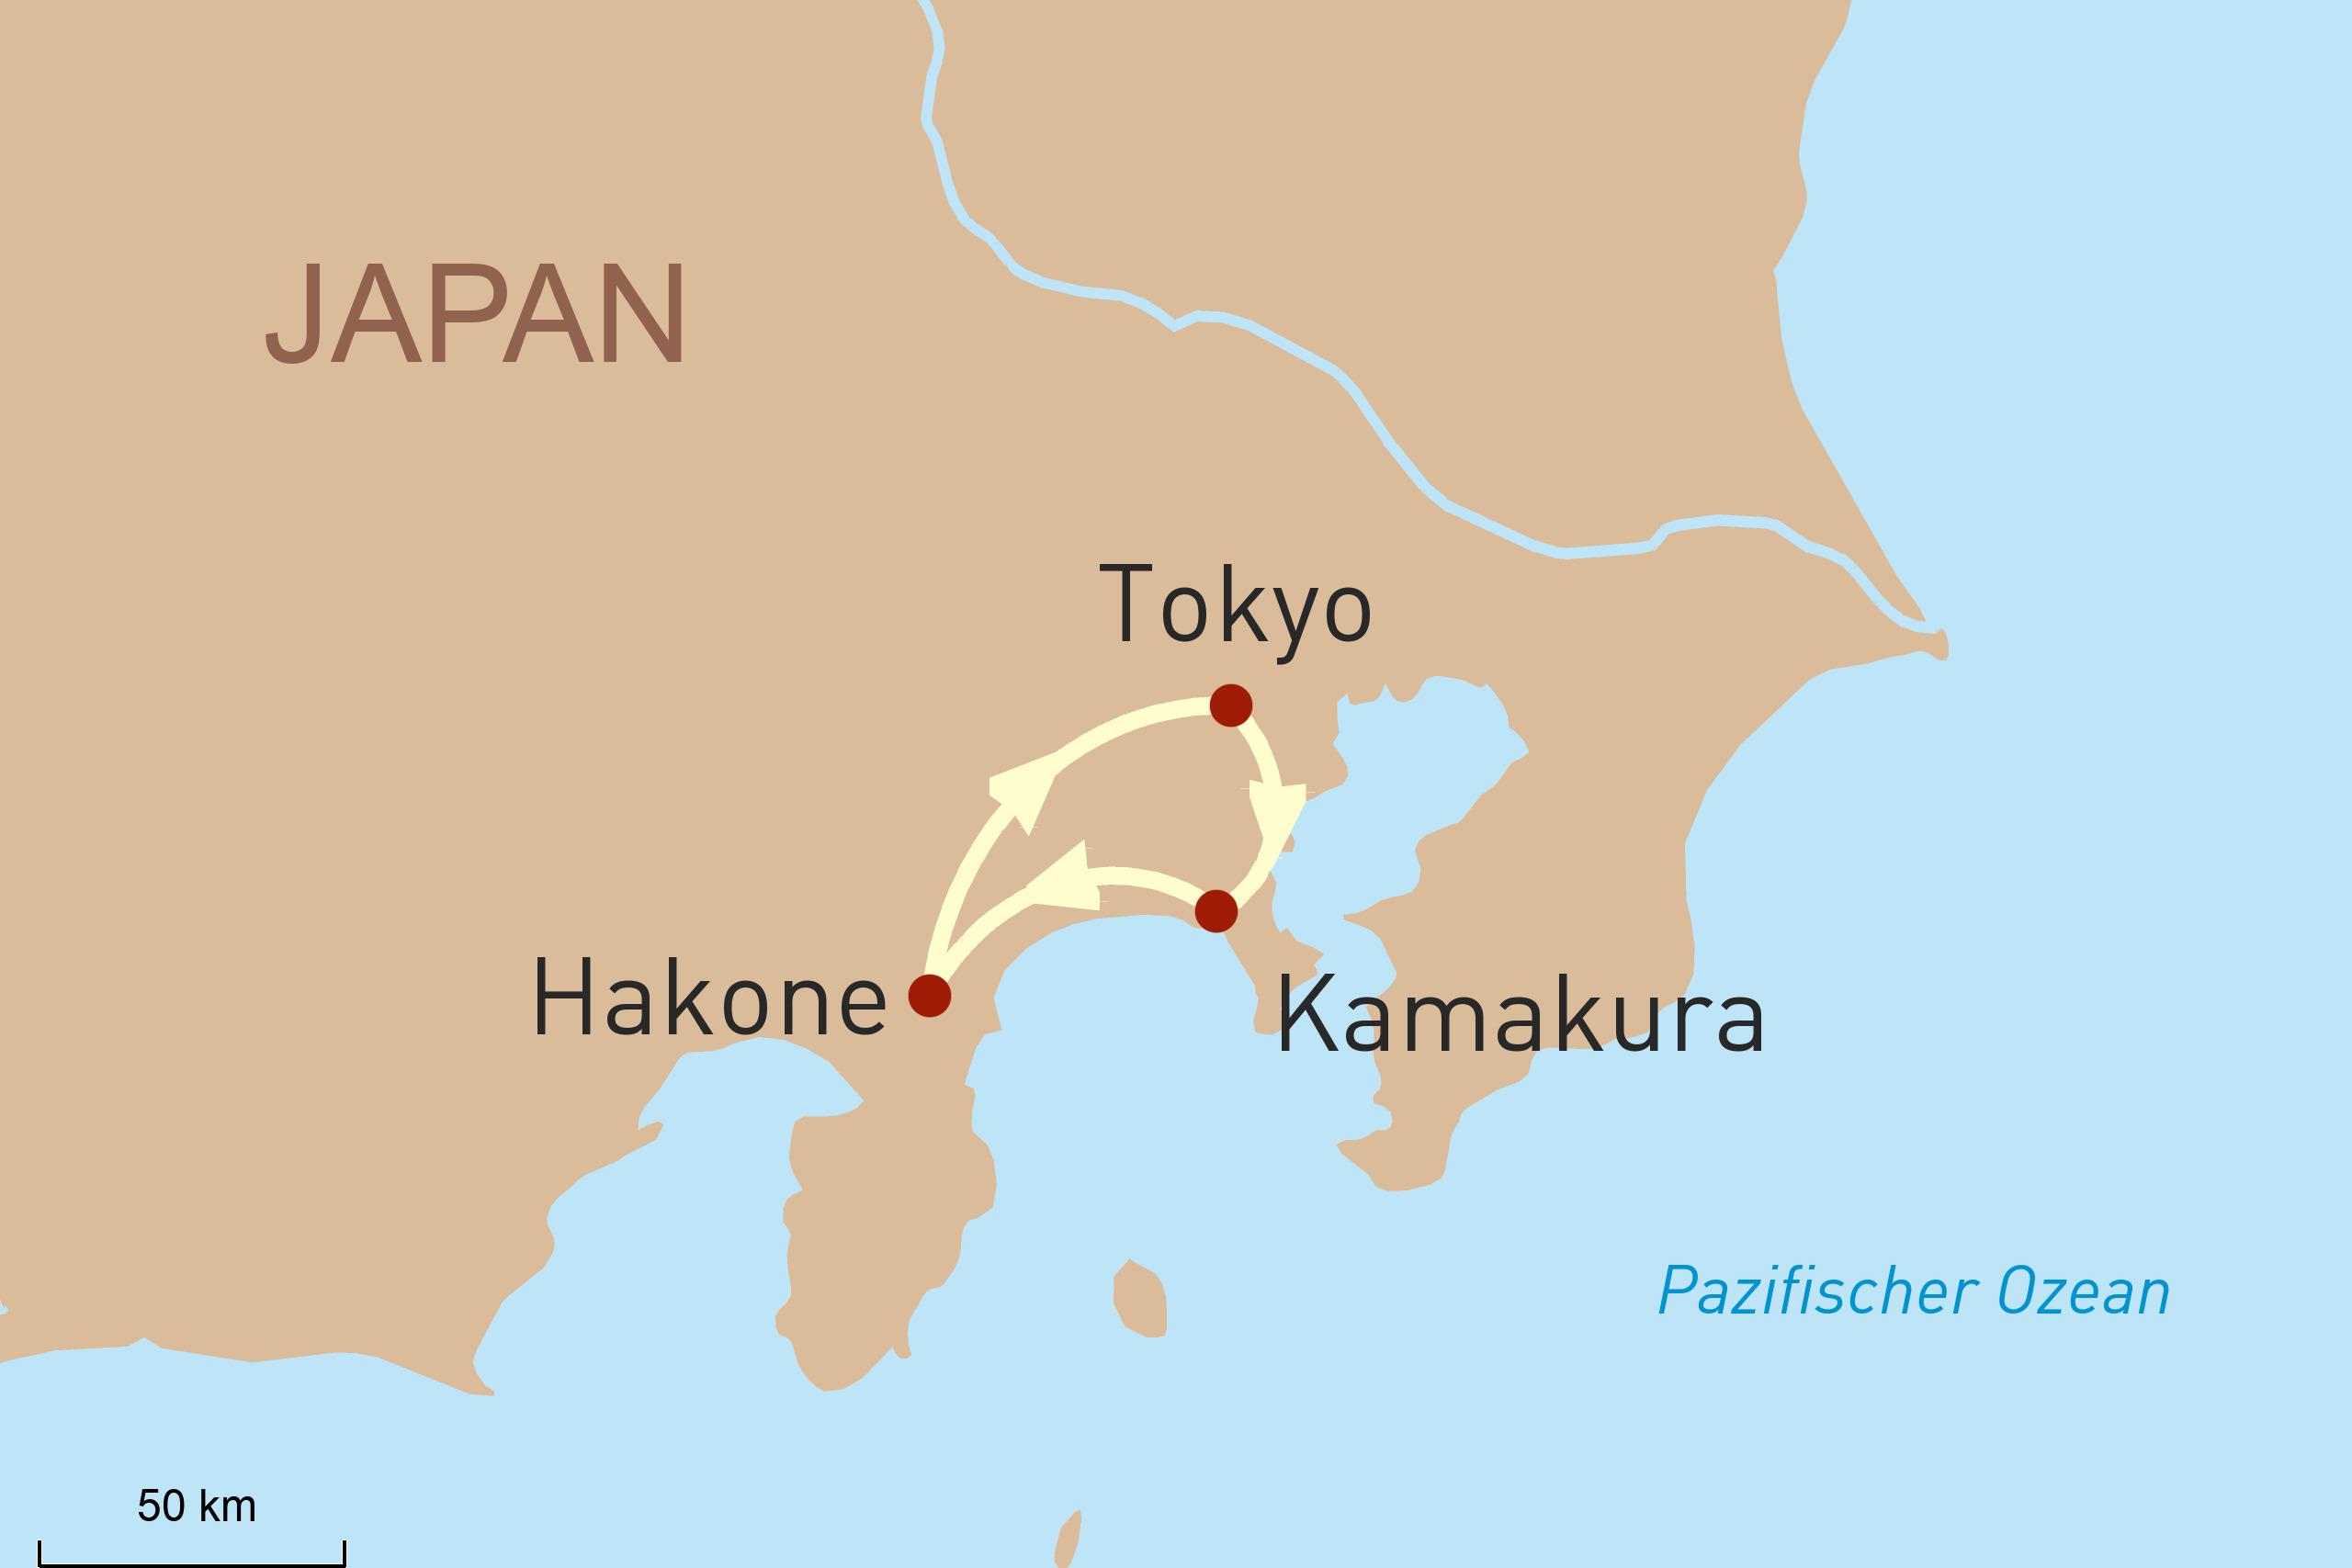 Landkarte für Drei perfekte Tage in Japans Metropole Tokyo